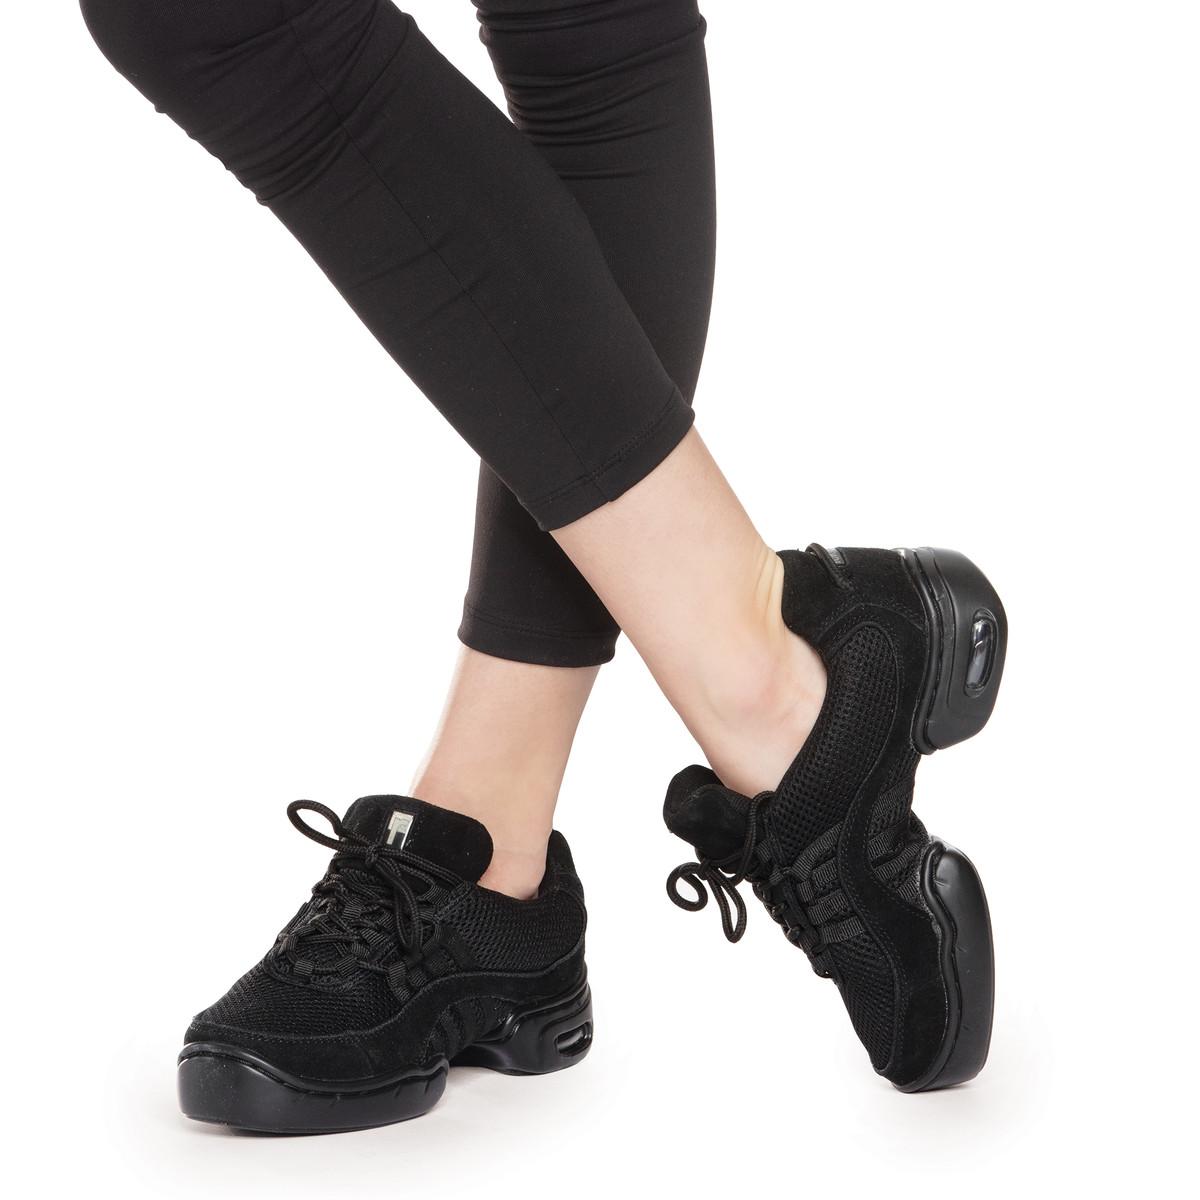 Ultra Arch Dance Sneaker Sizing Kit